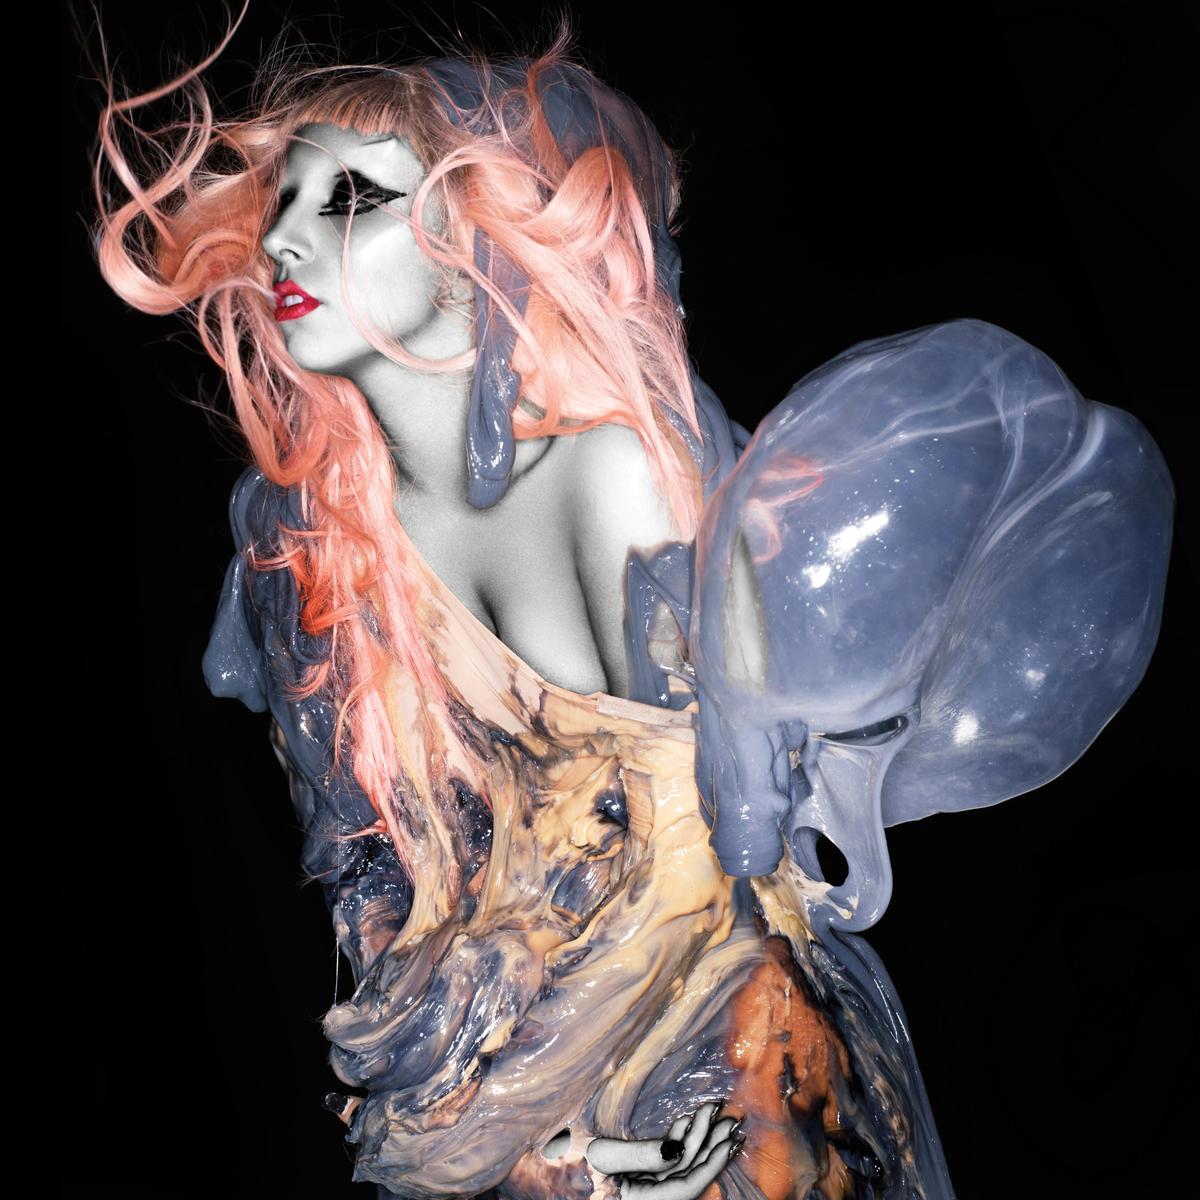 Nick Knight Photo Shoot [Born This Way]